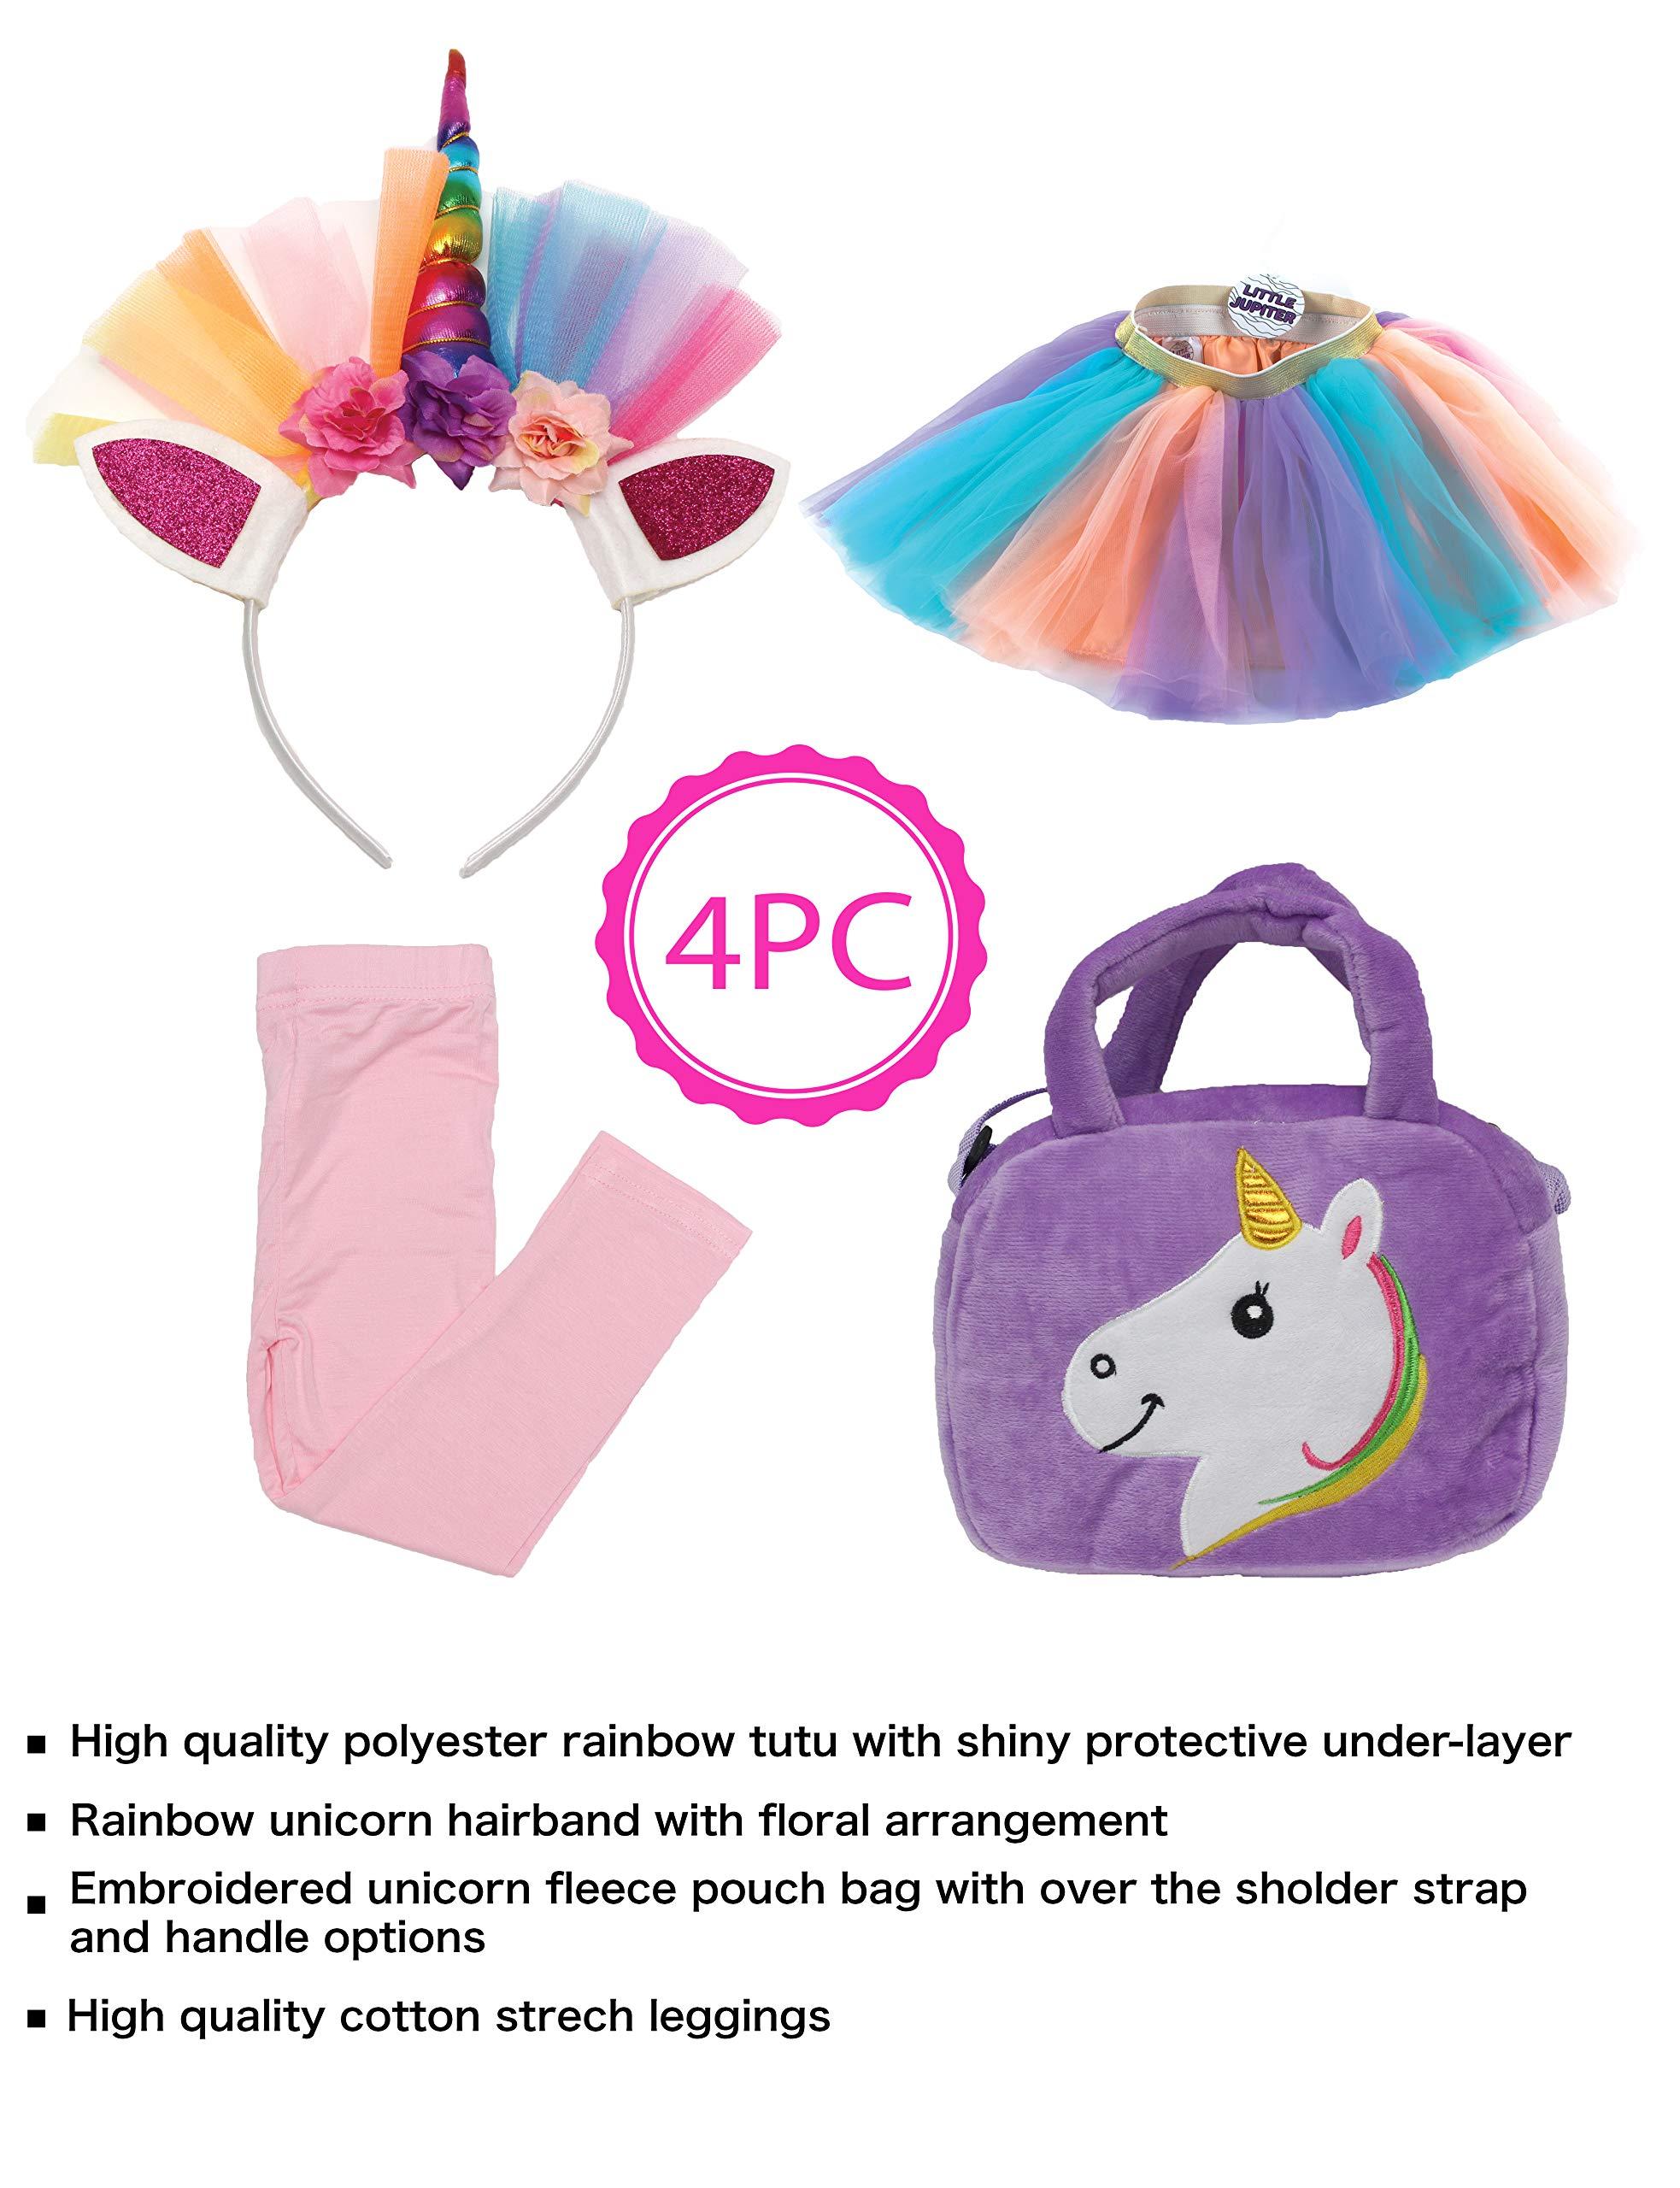 Little Jupiter Premium Girls Rainbow Unicorn Tutu Set 4PC Layered Dress for Age 2-8 Years Costume Unicorn Party 4